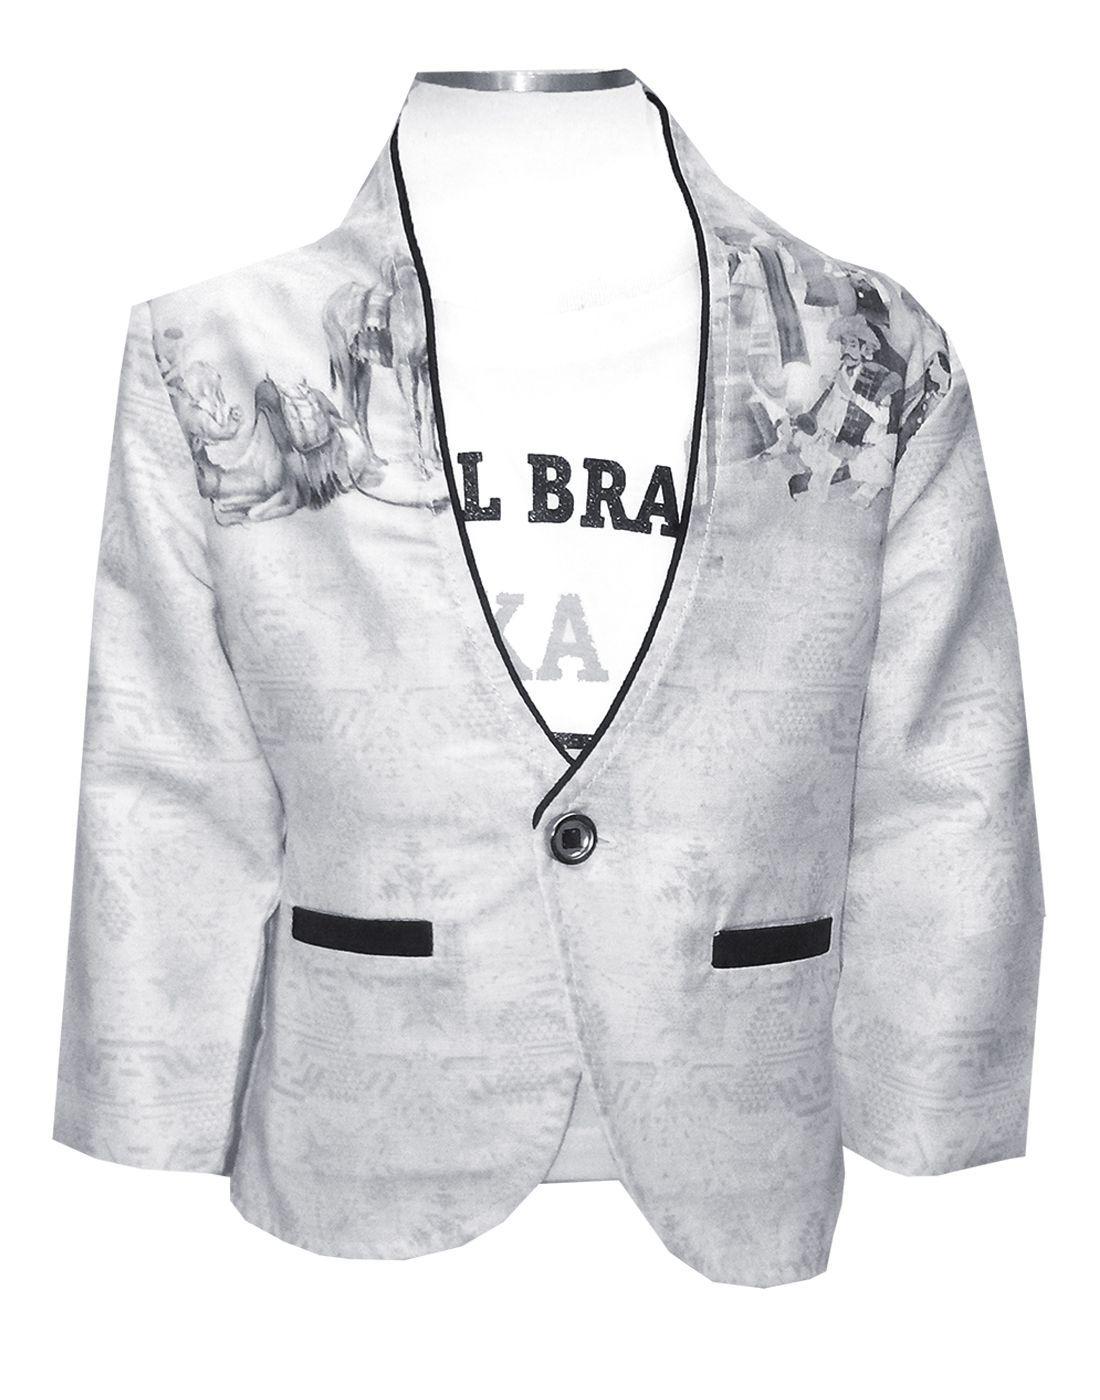 4703ecc885 Kooka Kids Boys Full Sleeves Blazer With Round Neck Half Sleeves T-Shirt  (2PC ...